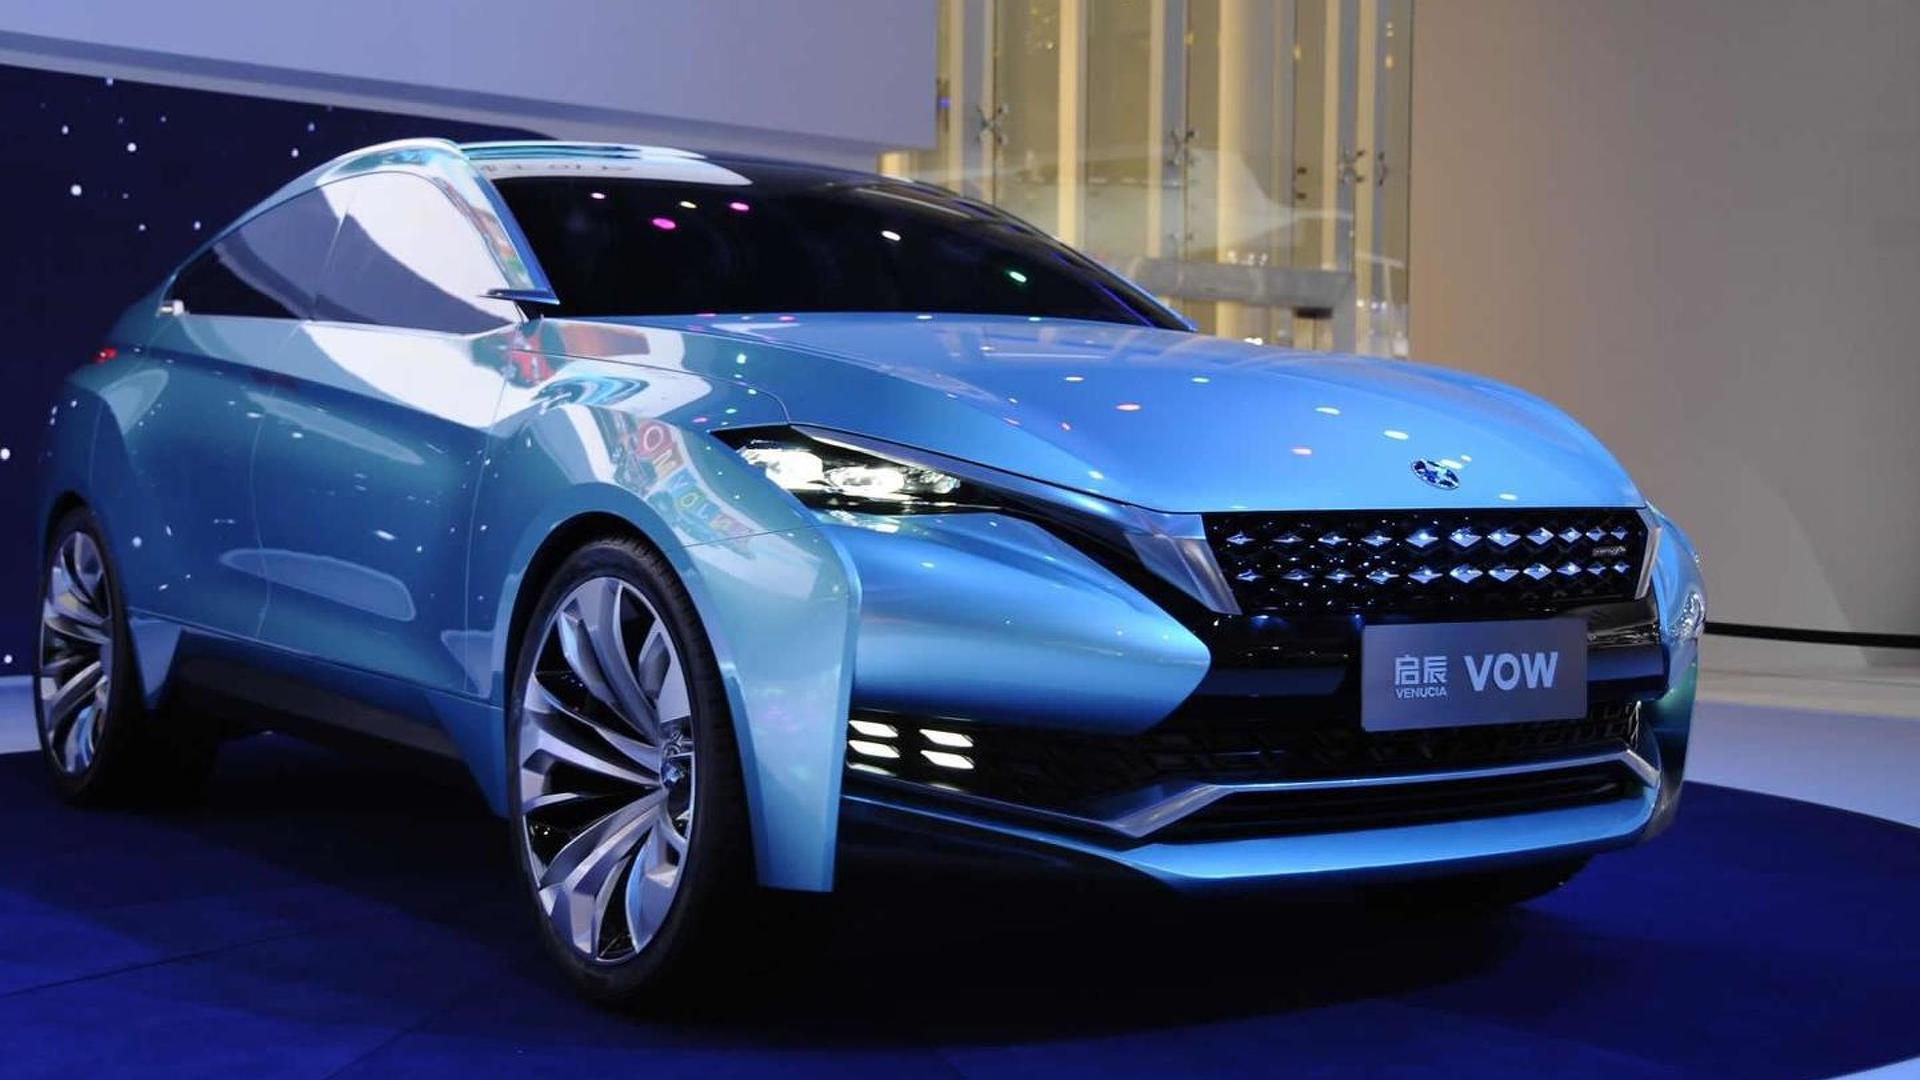 Venucia VOW concept breaks cover at Auto Shanghai